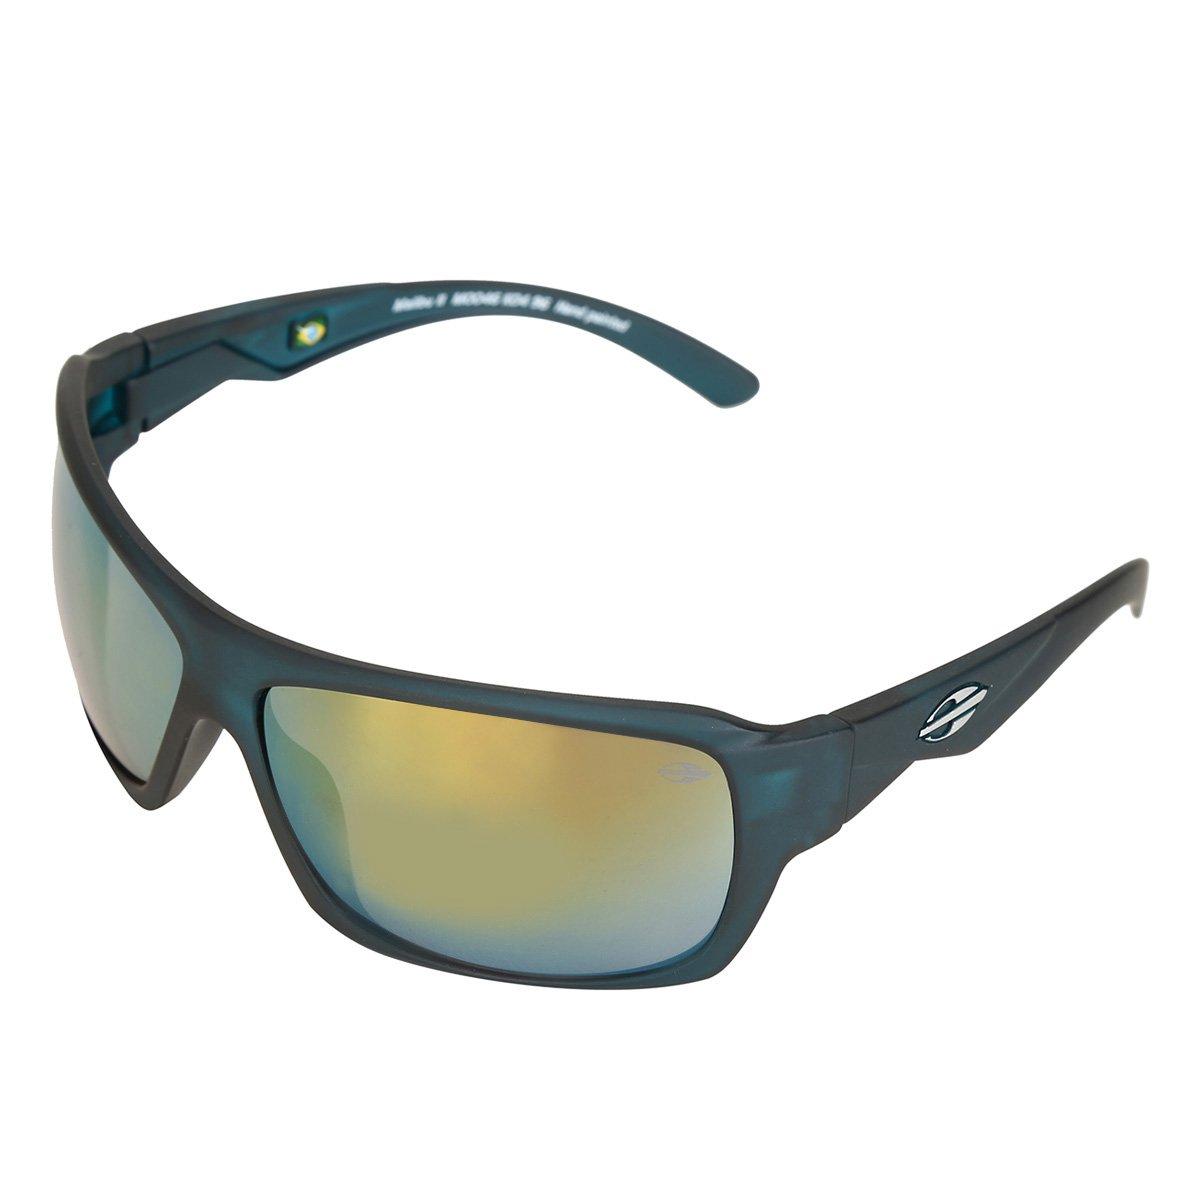 Óculos de Sol Mormaii Malibu 2 Masculino - Compre Agora   Netshoes 0958edc82e